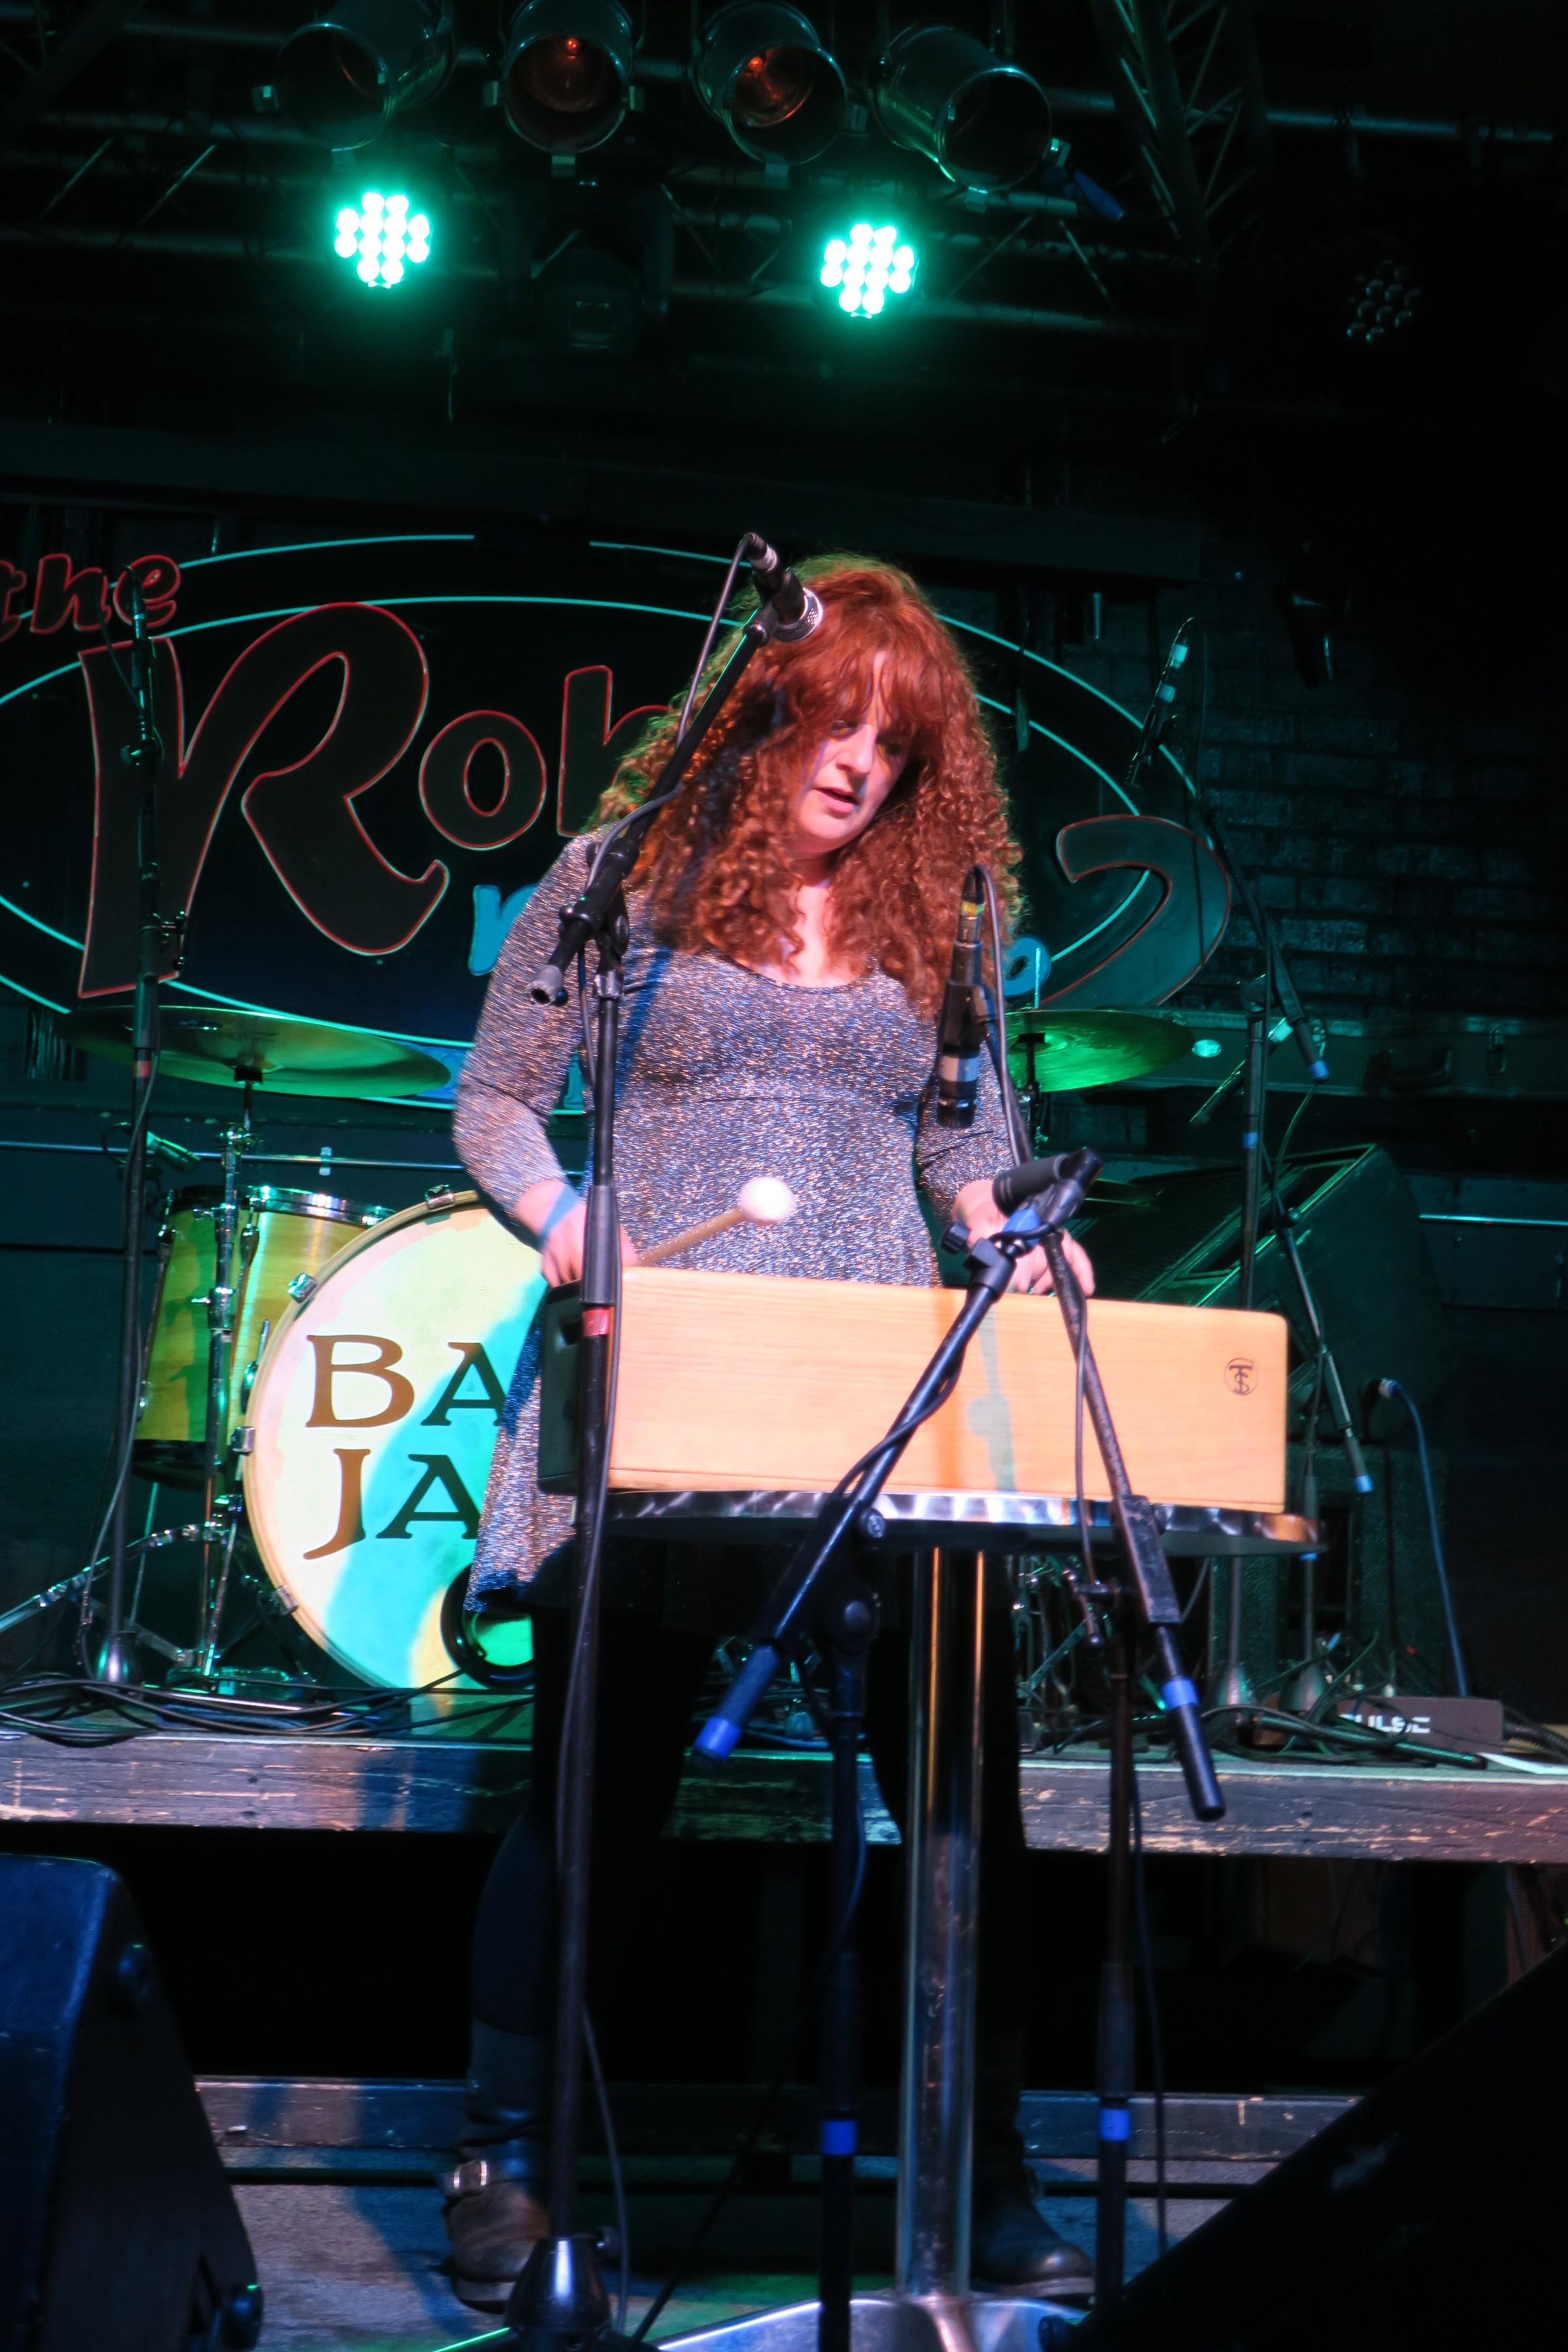 Babajack – The Robin 2, Wolverhampton, 2 May 2018